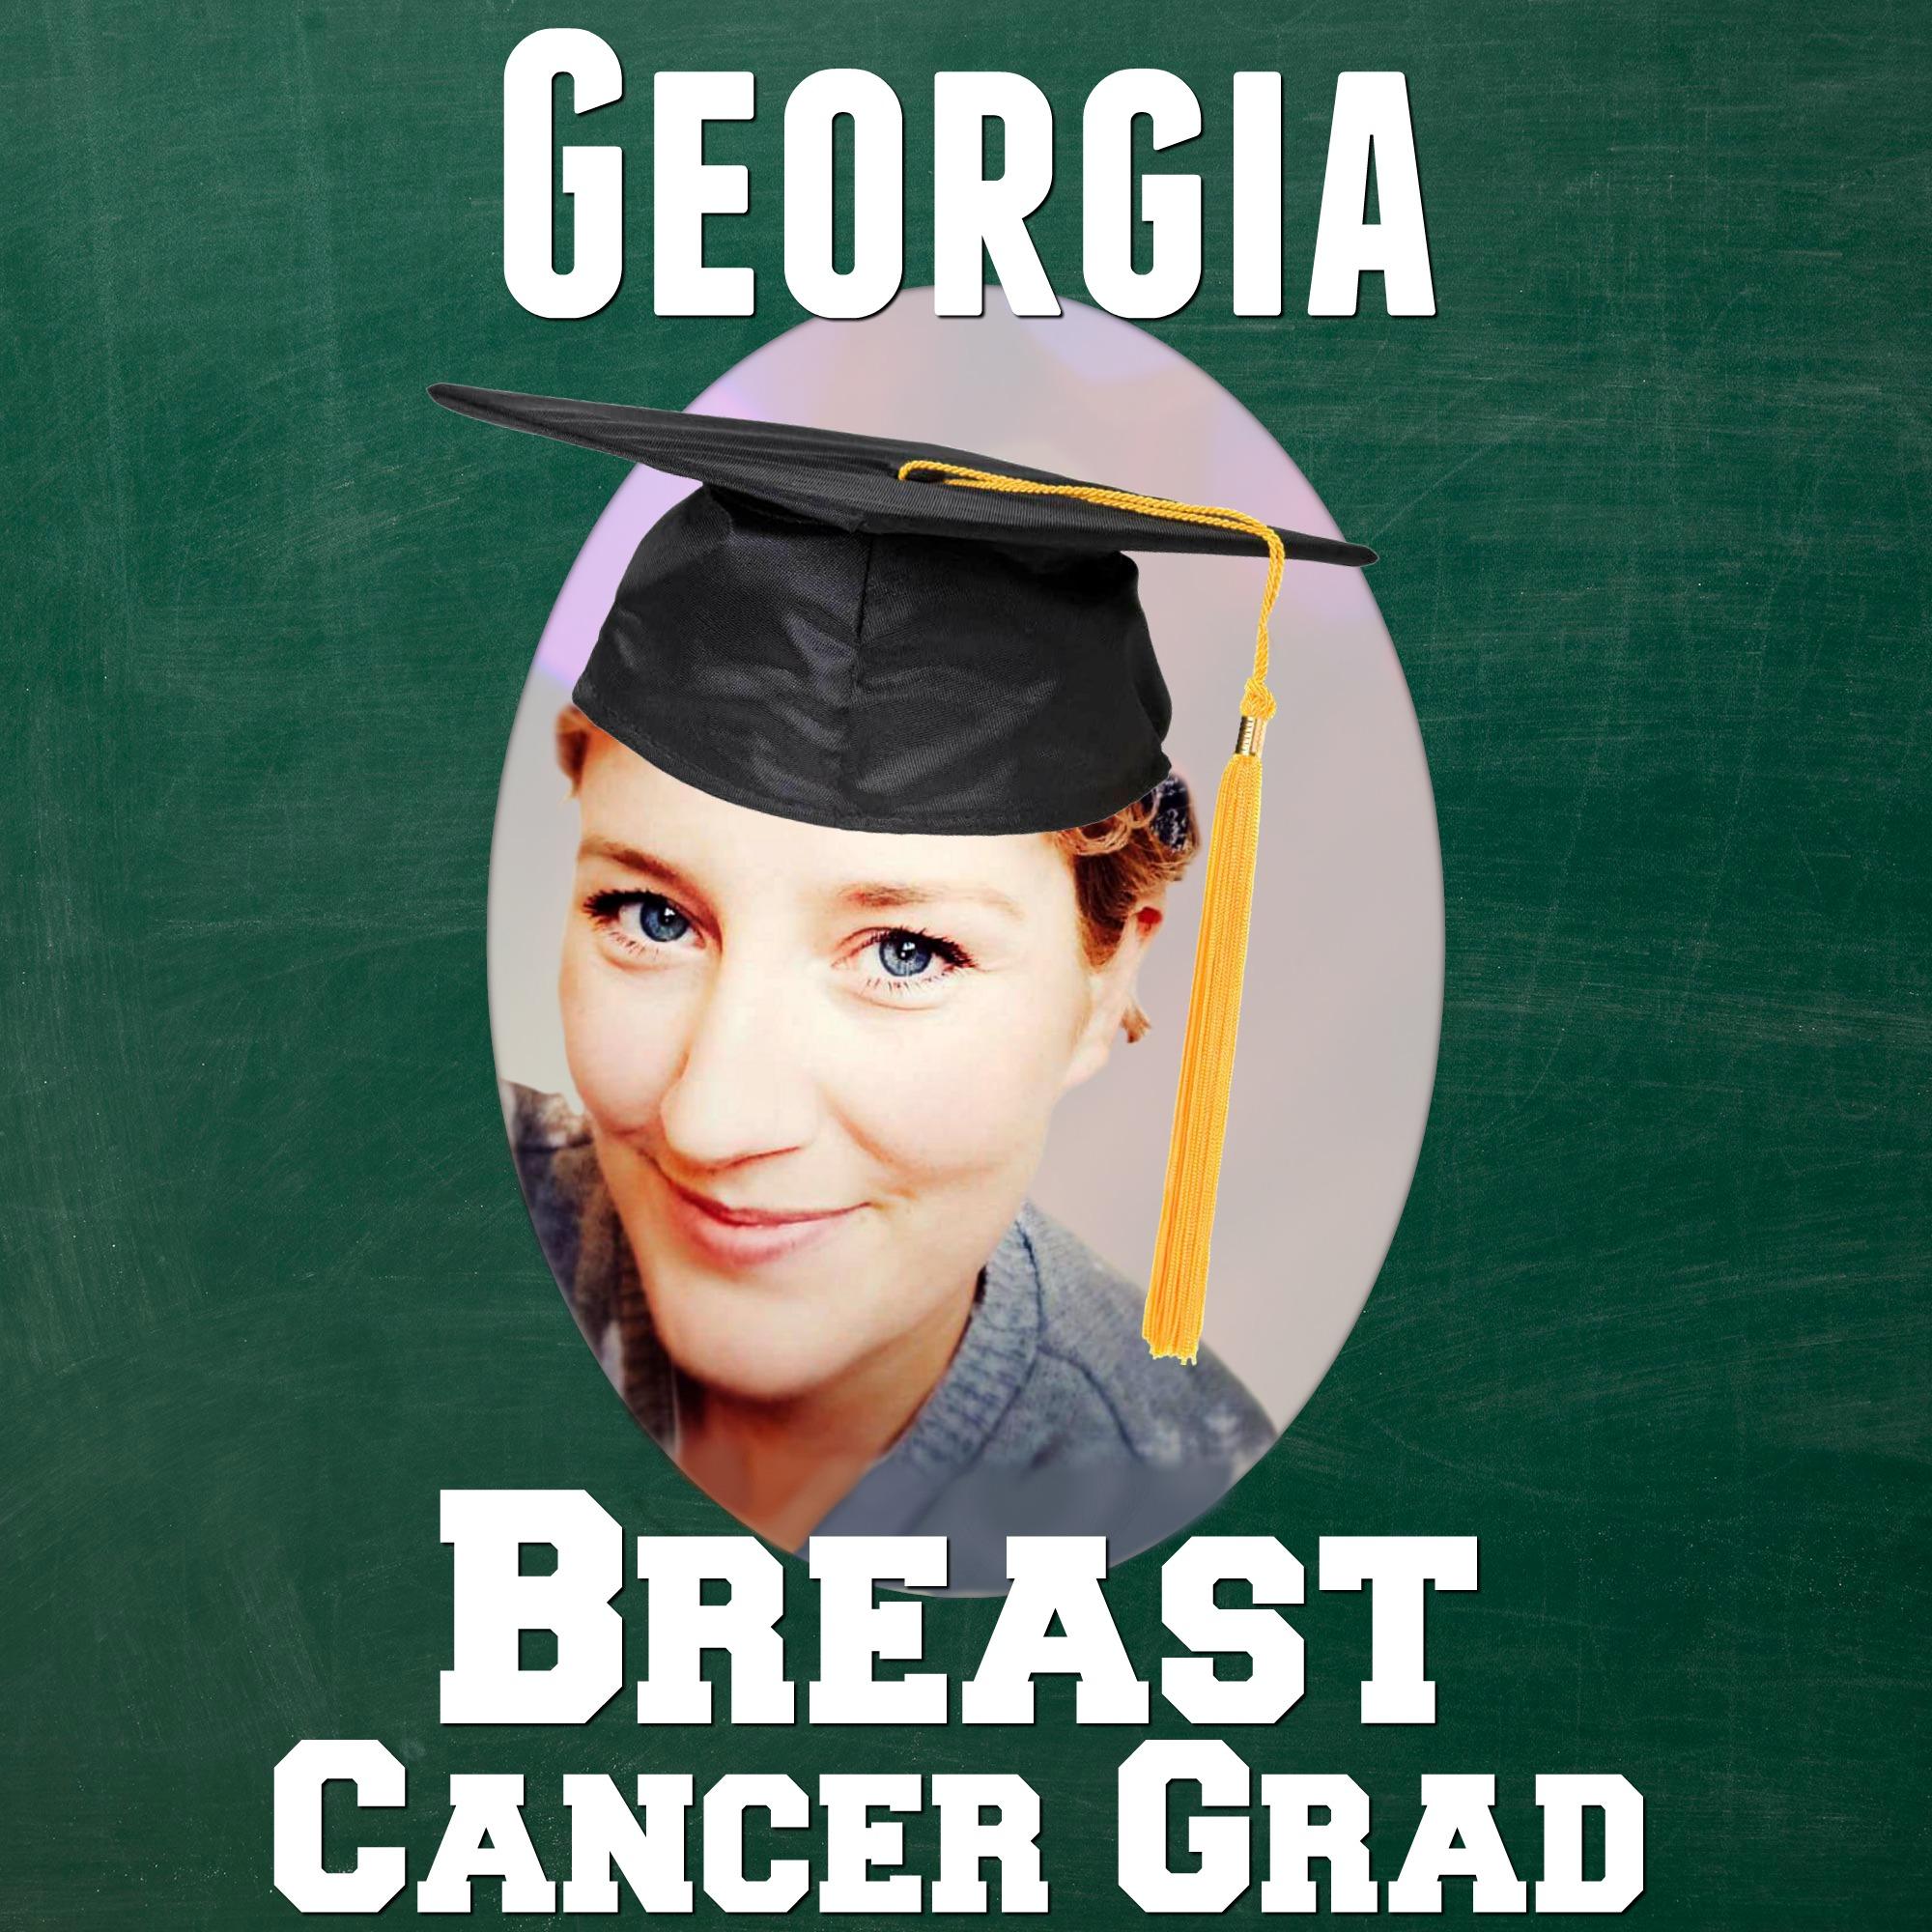 georgia cancer grad breast cancergrad yearbook photo cap graduation graduate